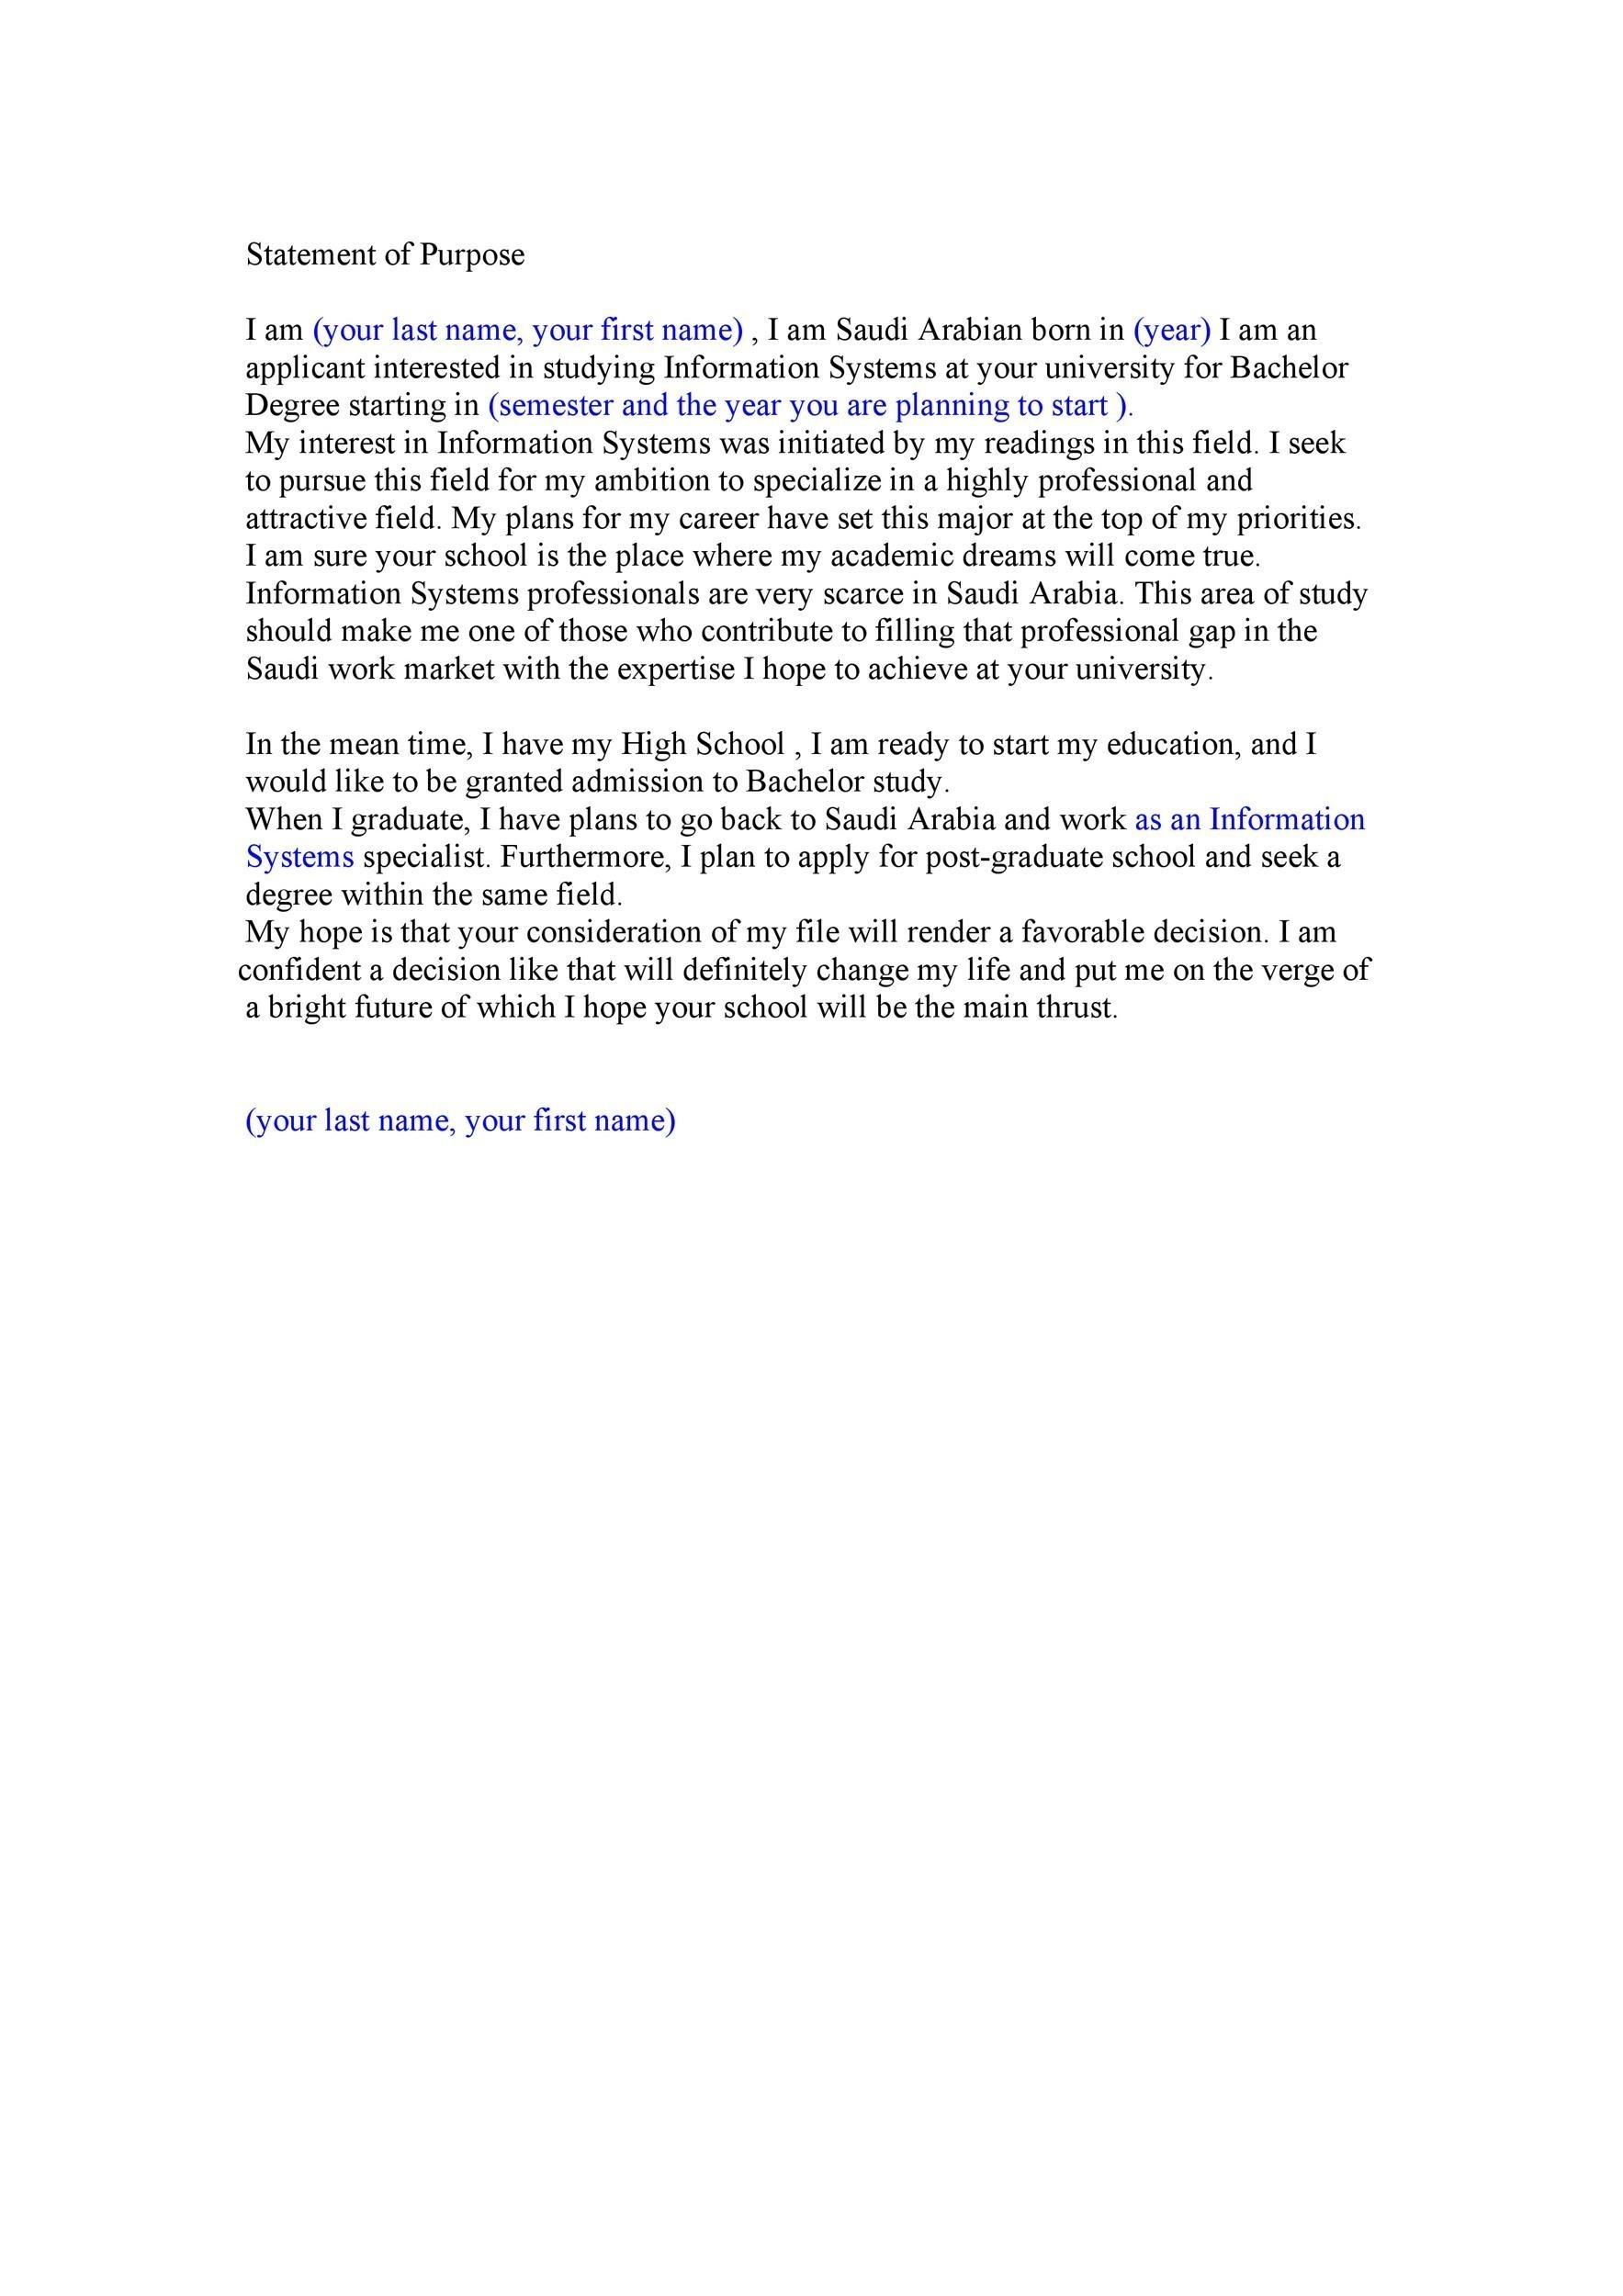 Free statement of purpose example 27